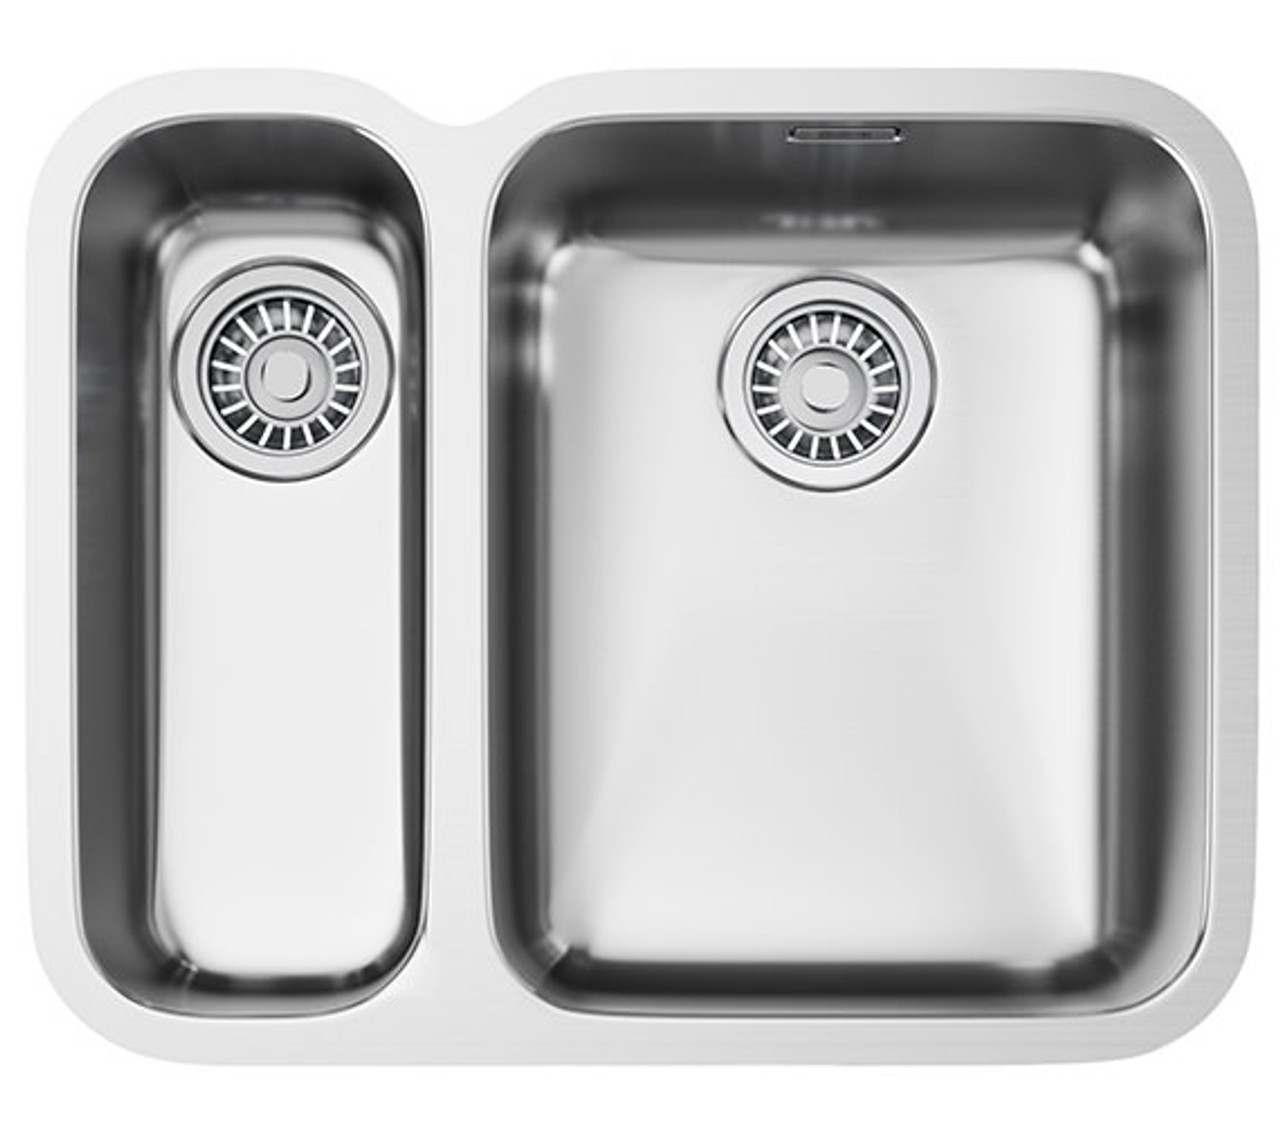 franke ariane arx160d stainless steel kitchen sink. beautiful ideas. Home Design Ideas